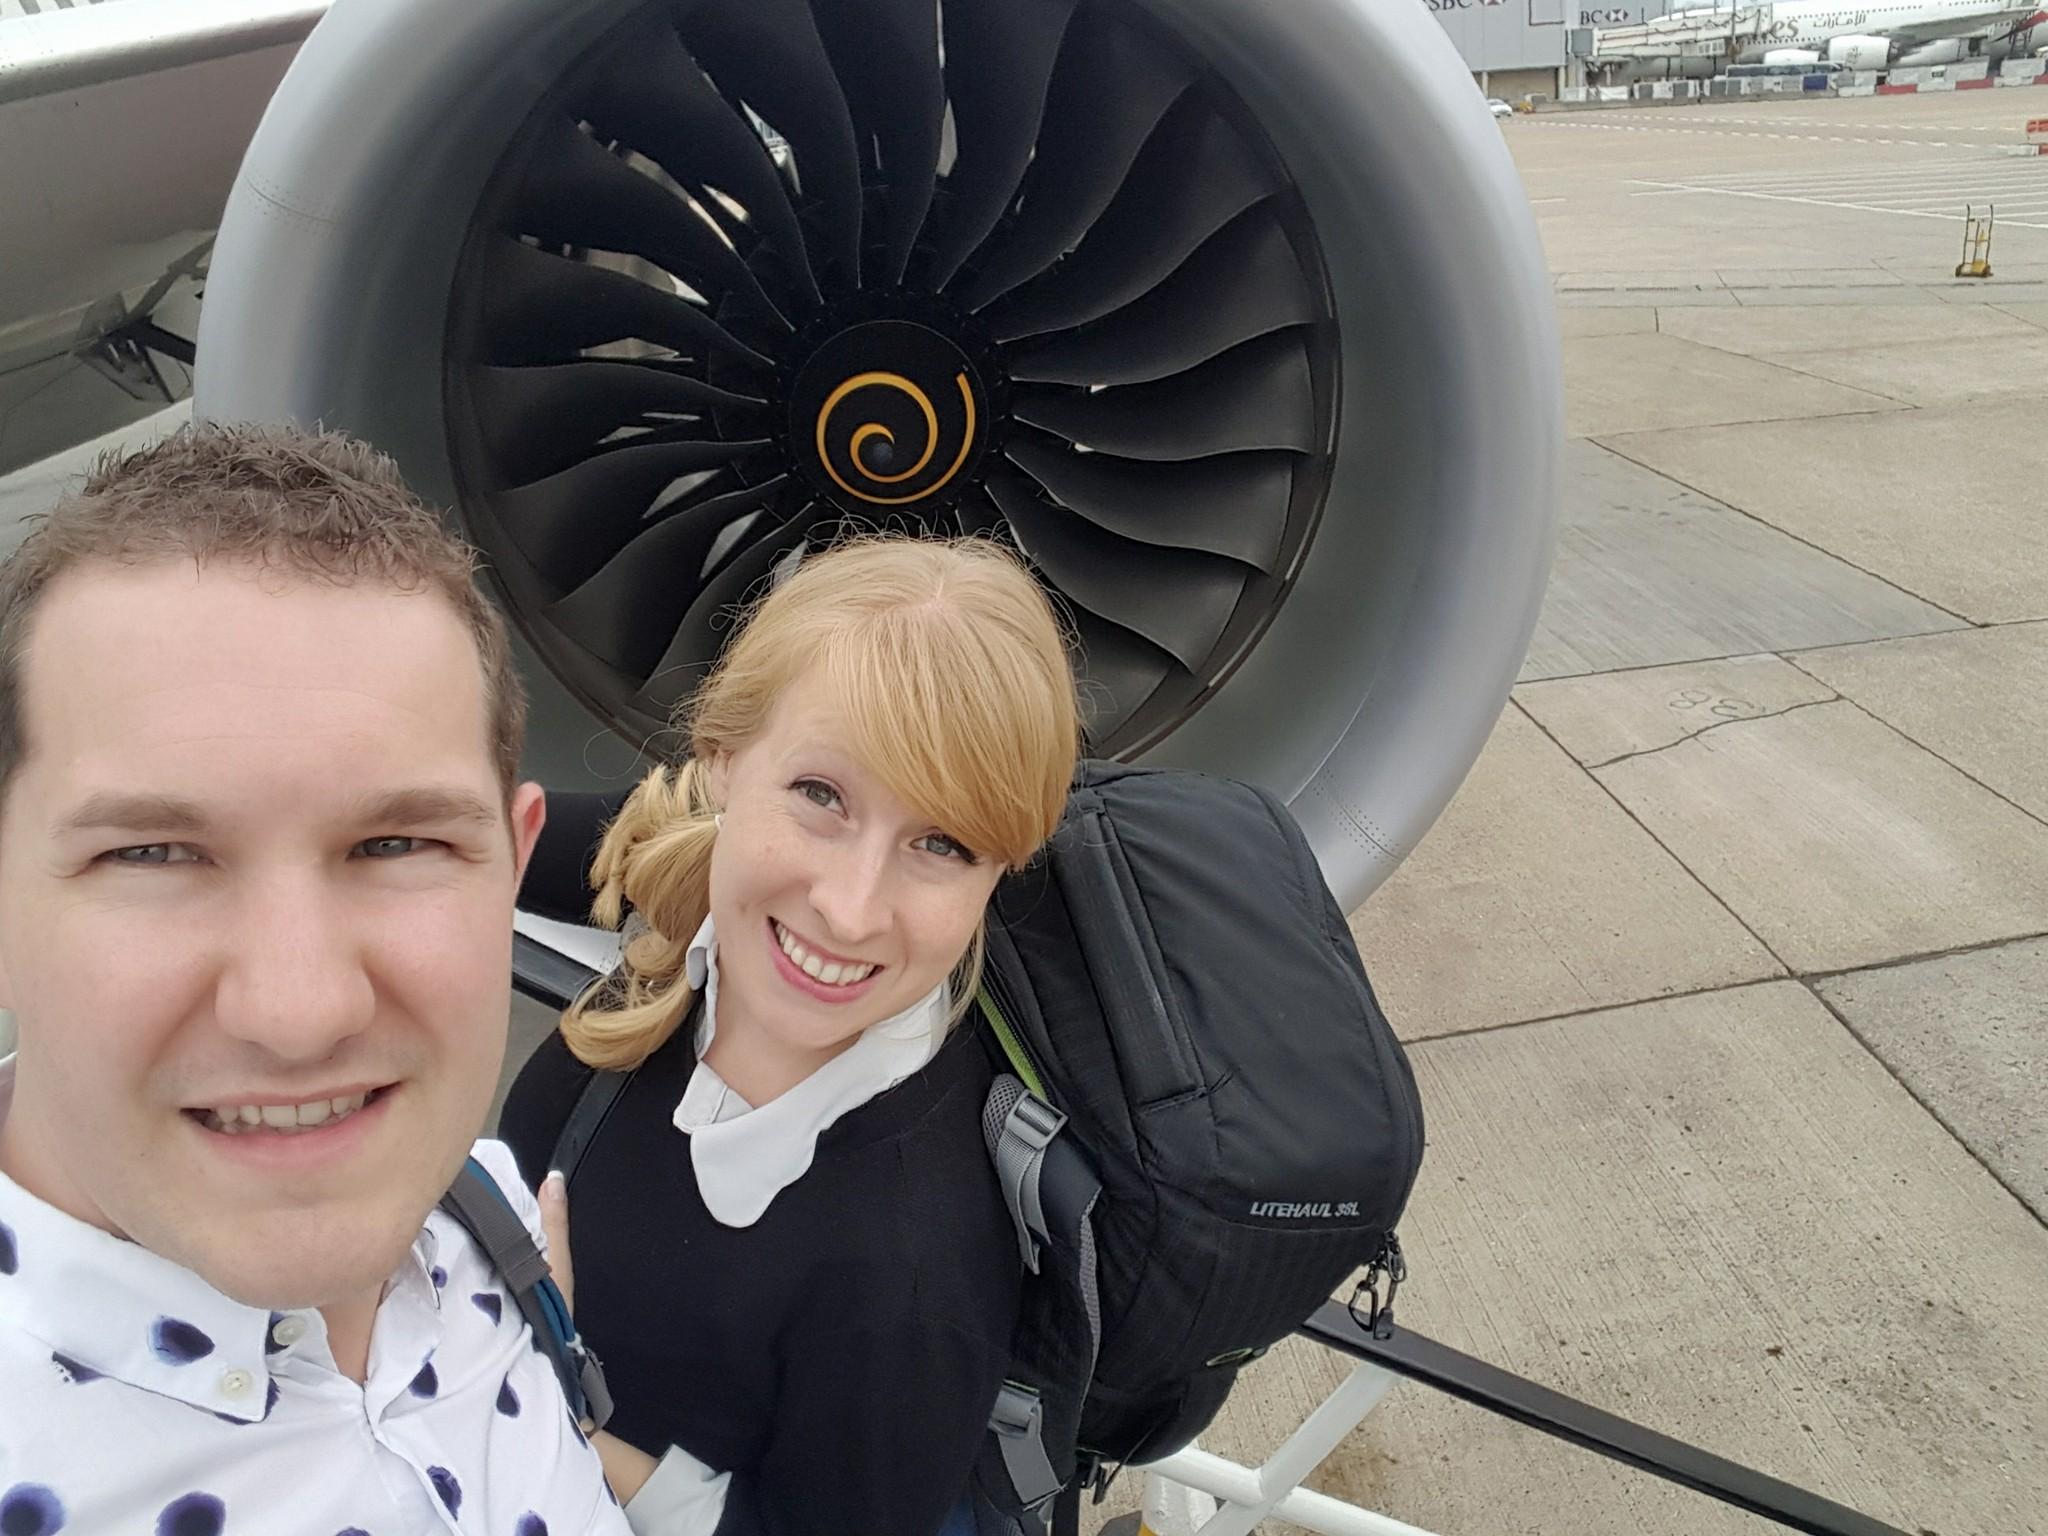 Karl and Rosie wait to board their Virgin Atlantic flight to Miami